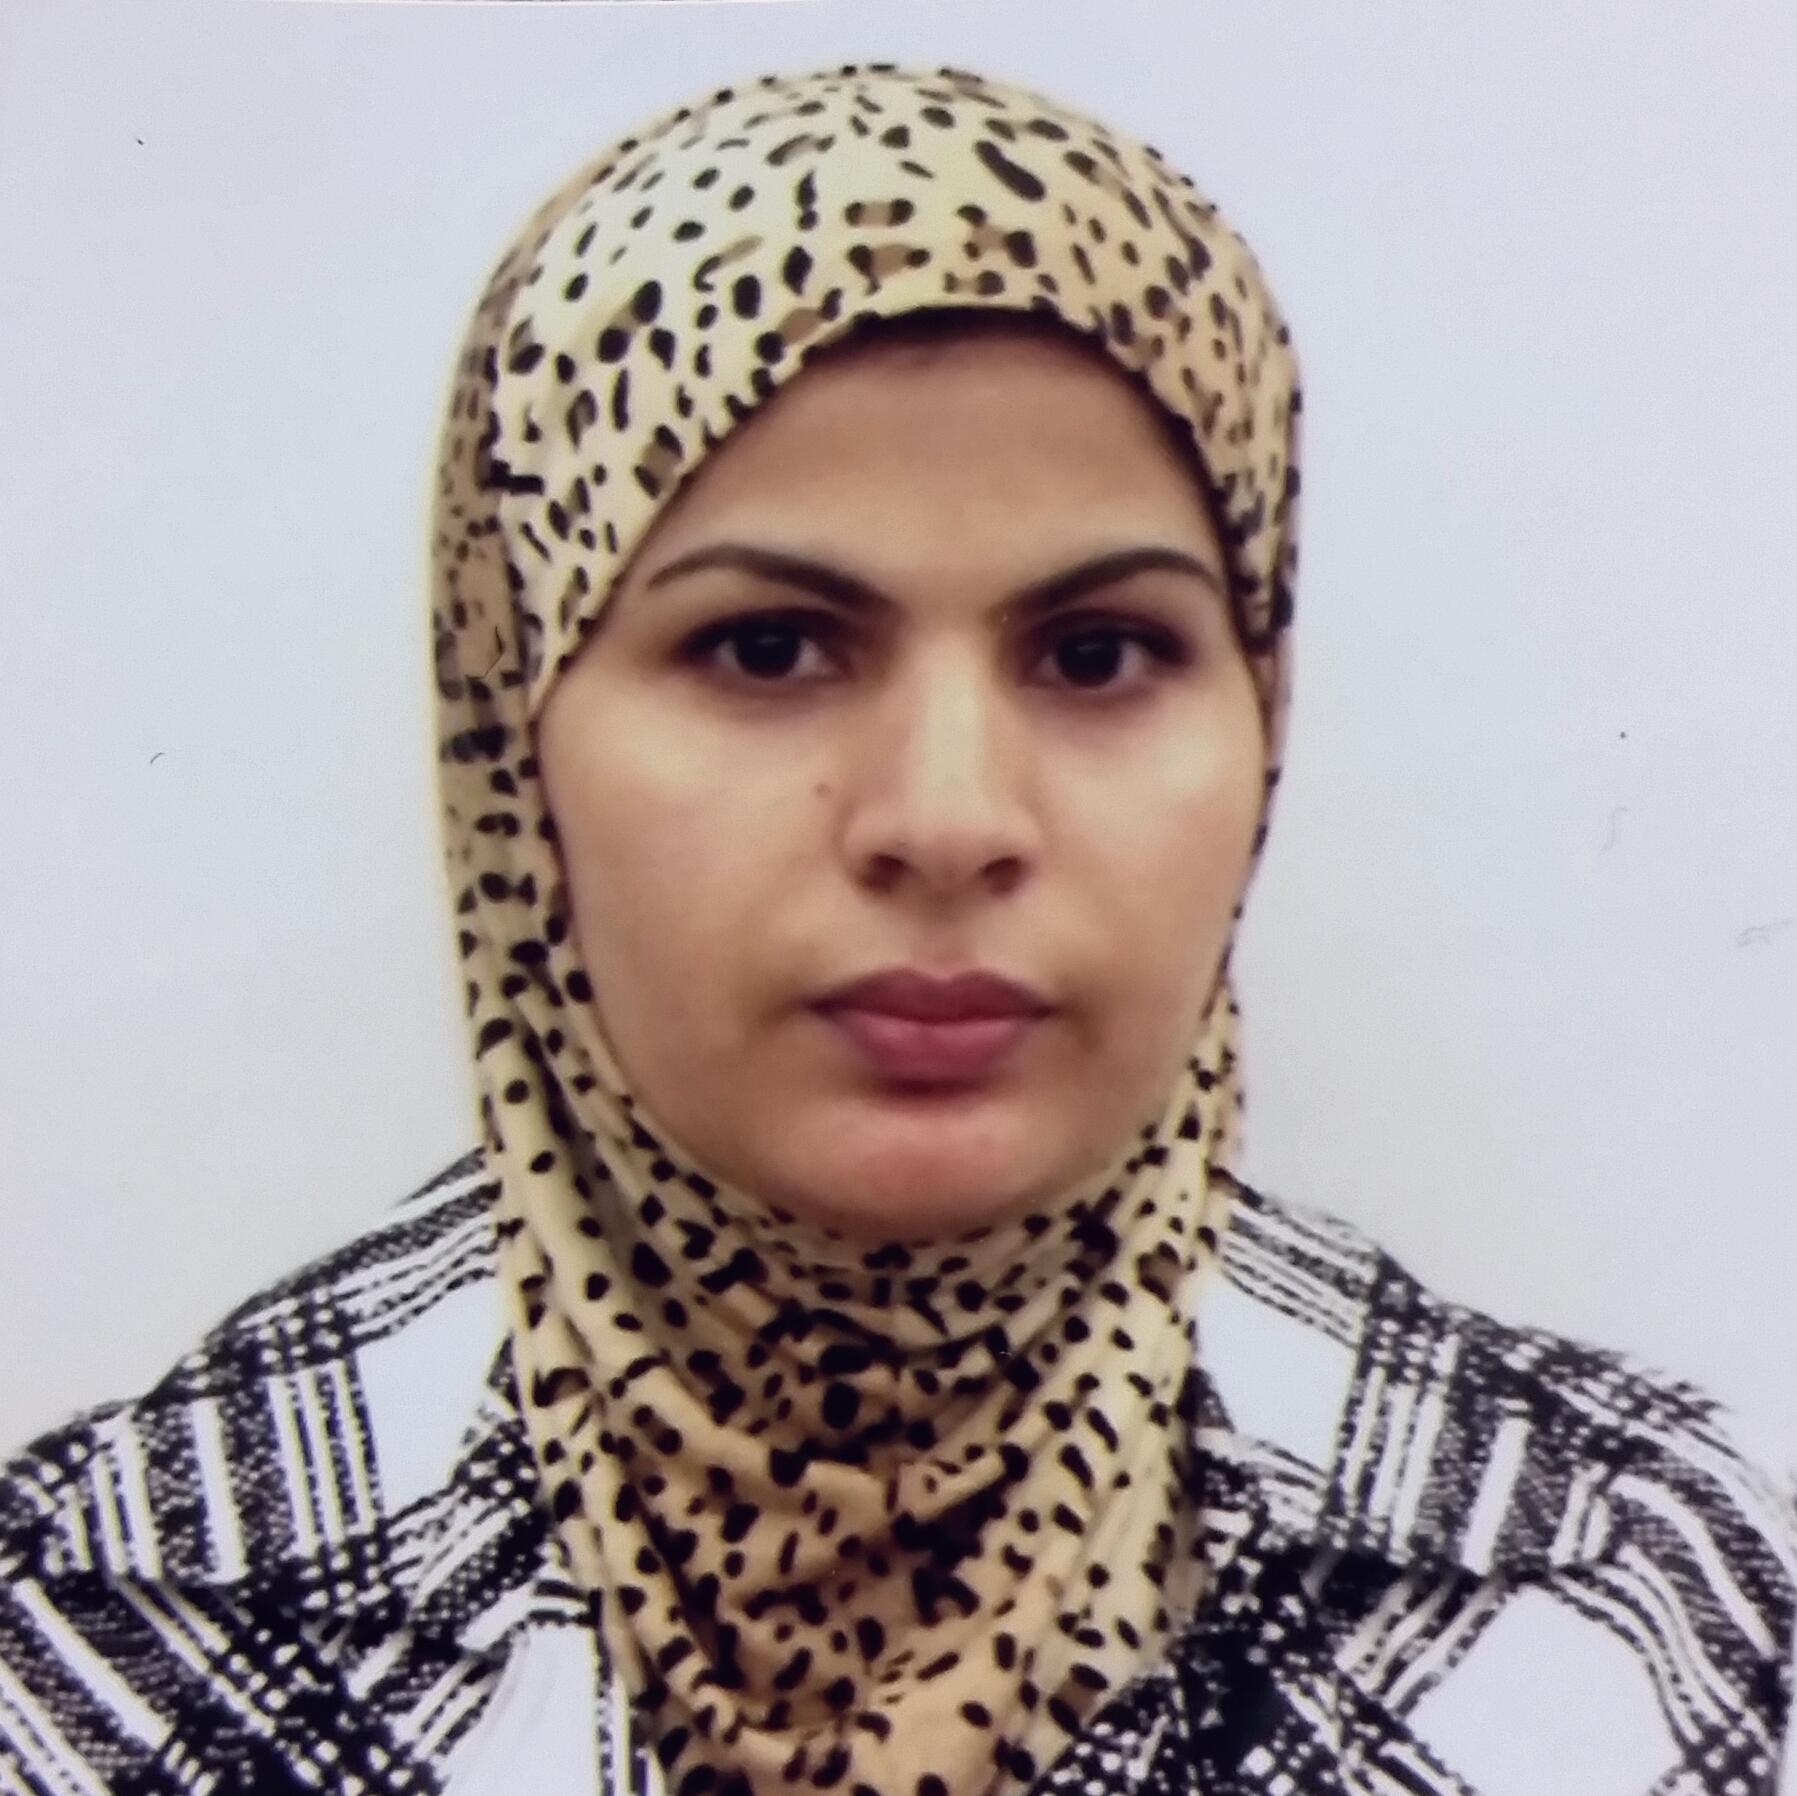 Headshot of Nasra Sultana, Ph.D.